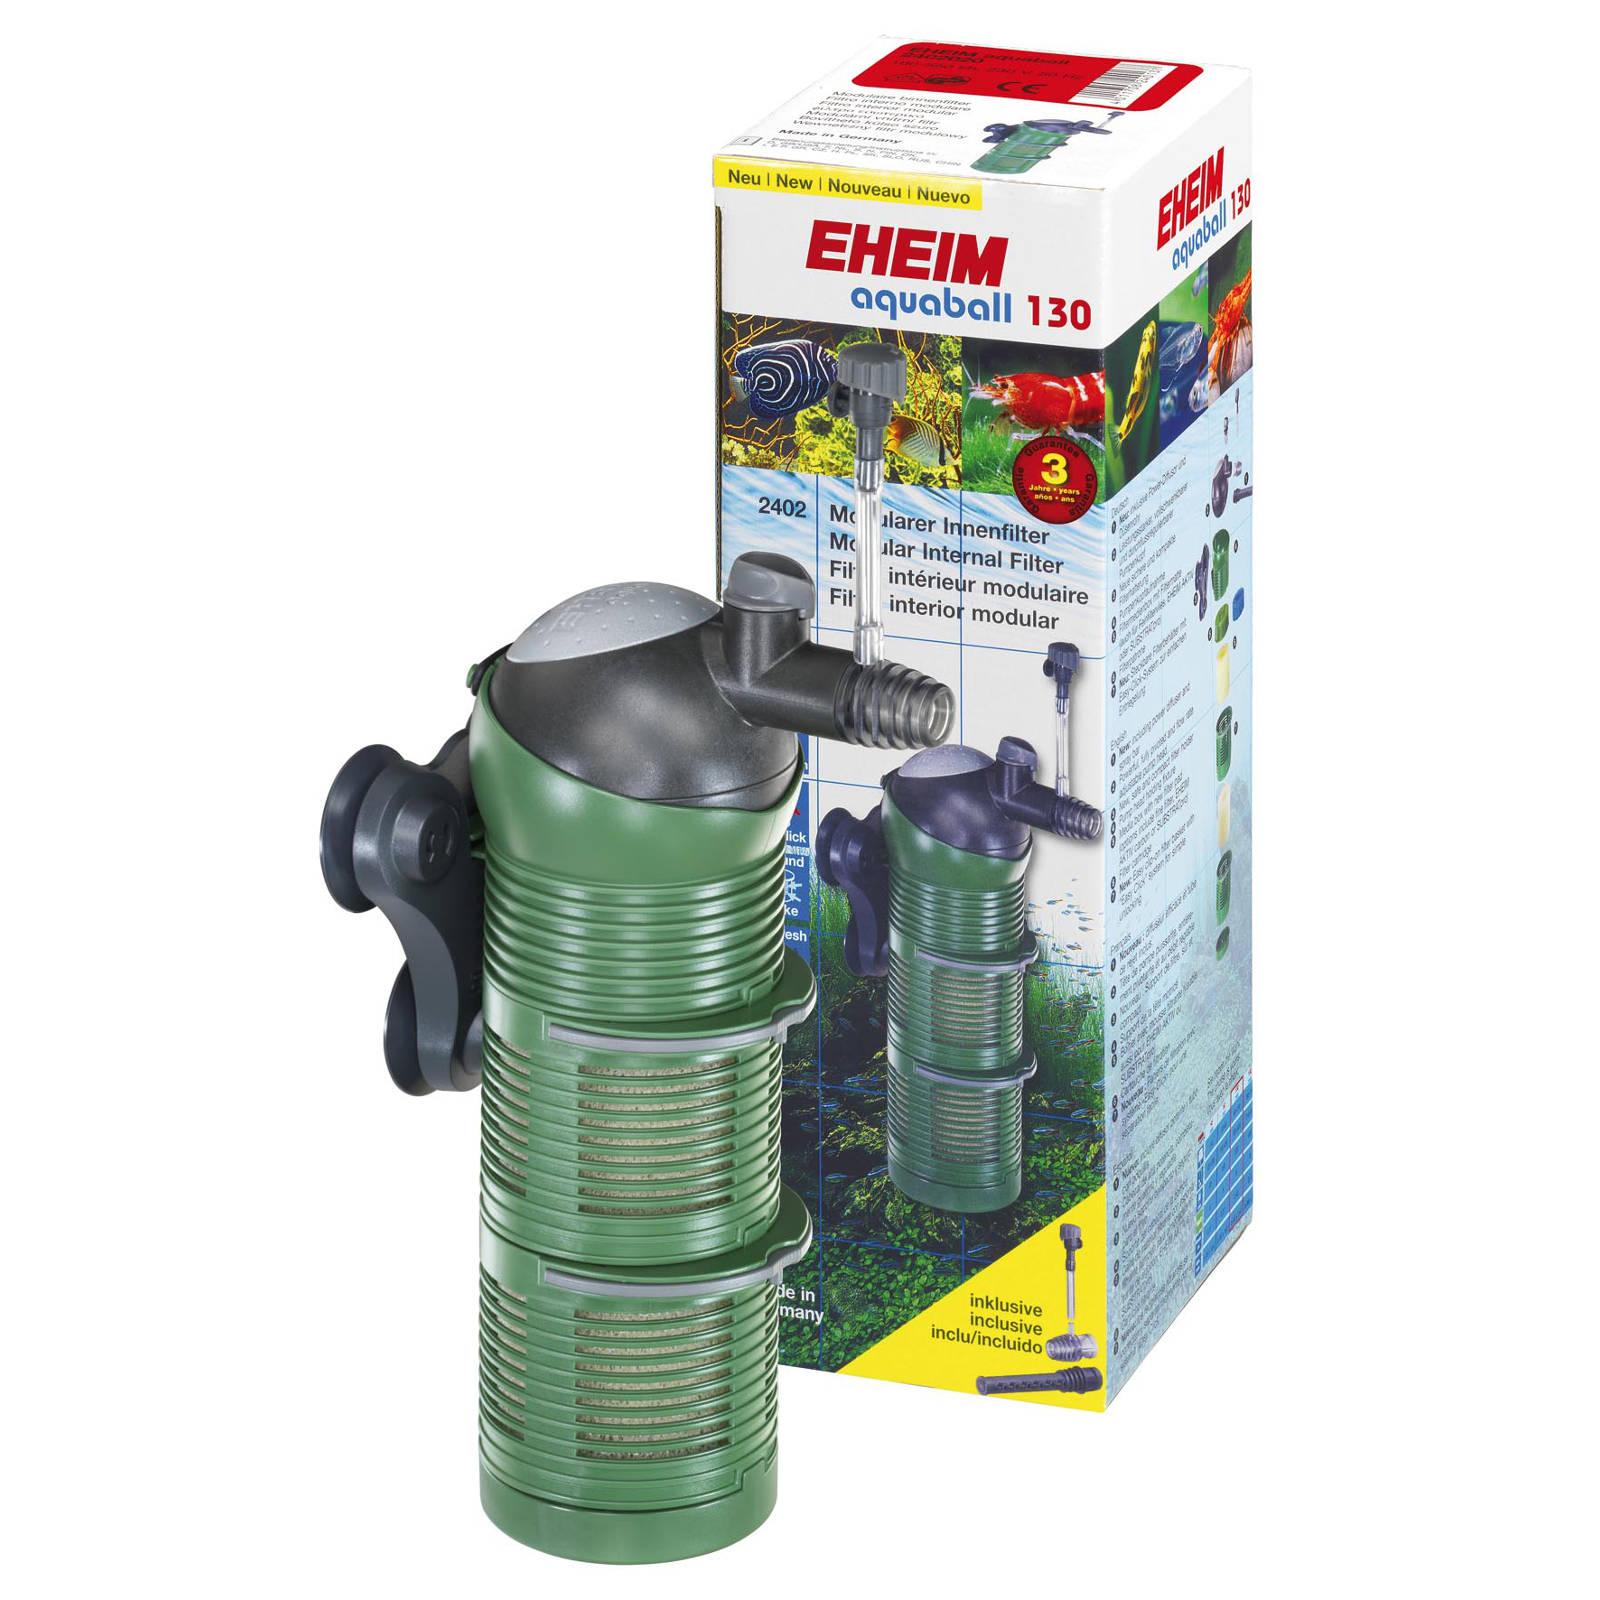 EHEIM aquaball 130 Innenfilter mit 2x Filterpatrone und Media-Box